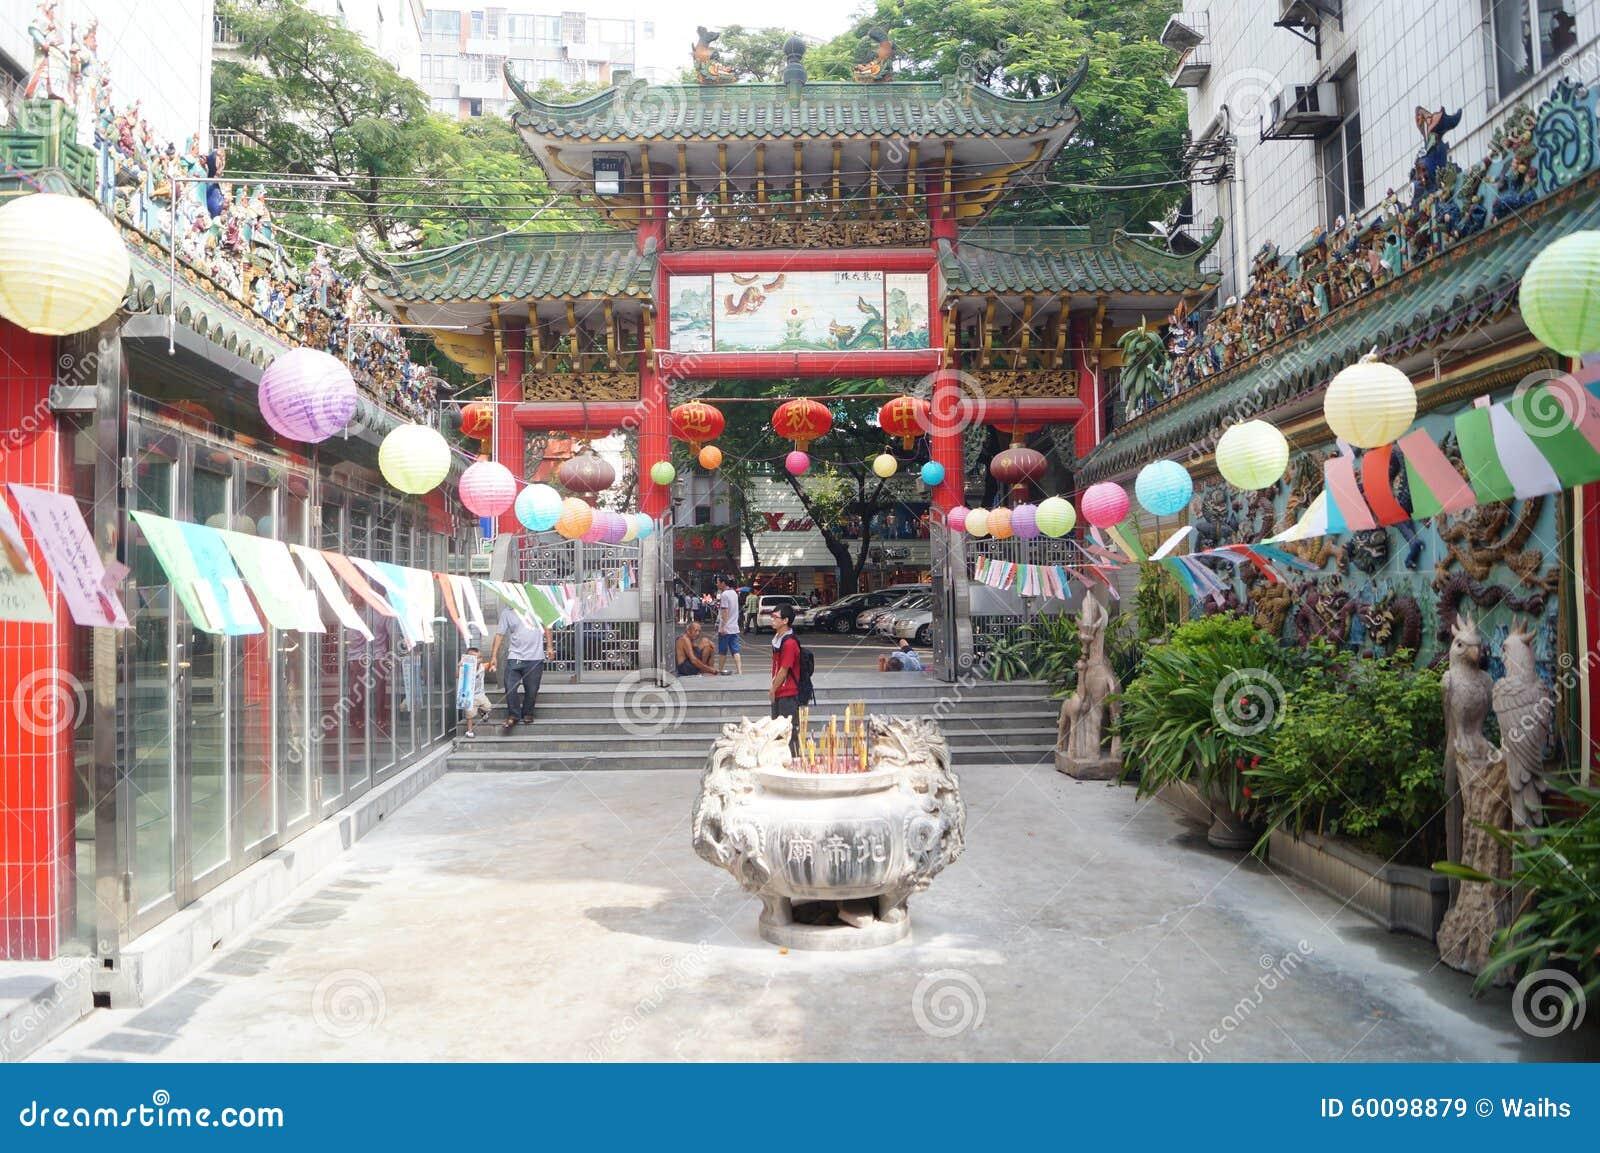 Shenzhen, China: Guess Riddles Written On Lanterns Festival